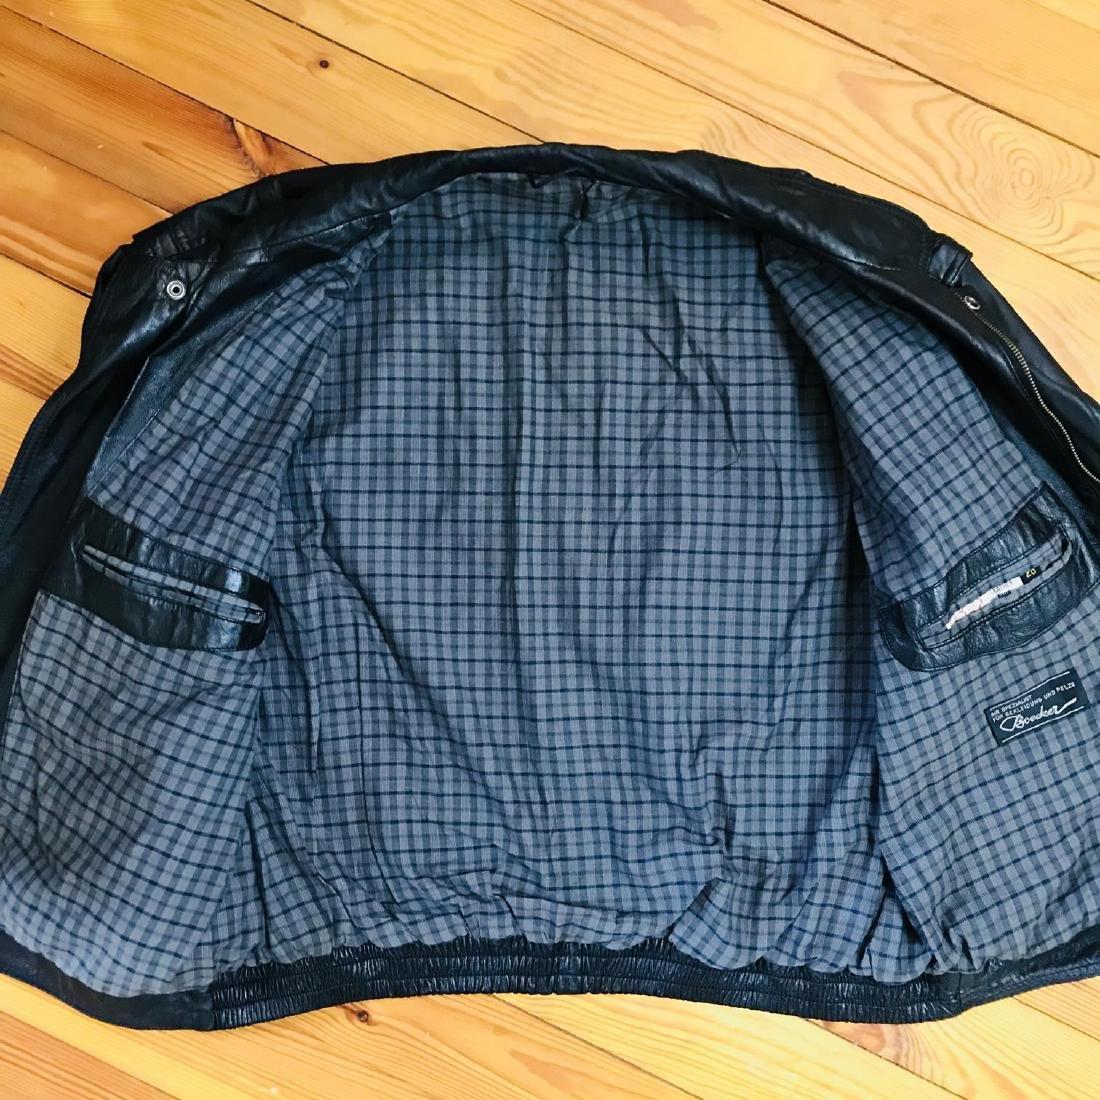 Vintage Men's Boecker Leather Jacket Size US 42 - 7